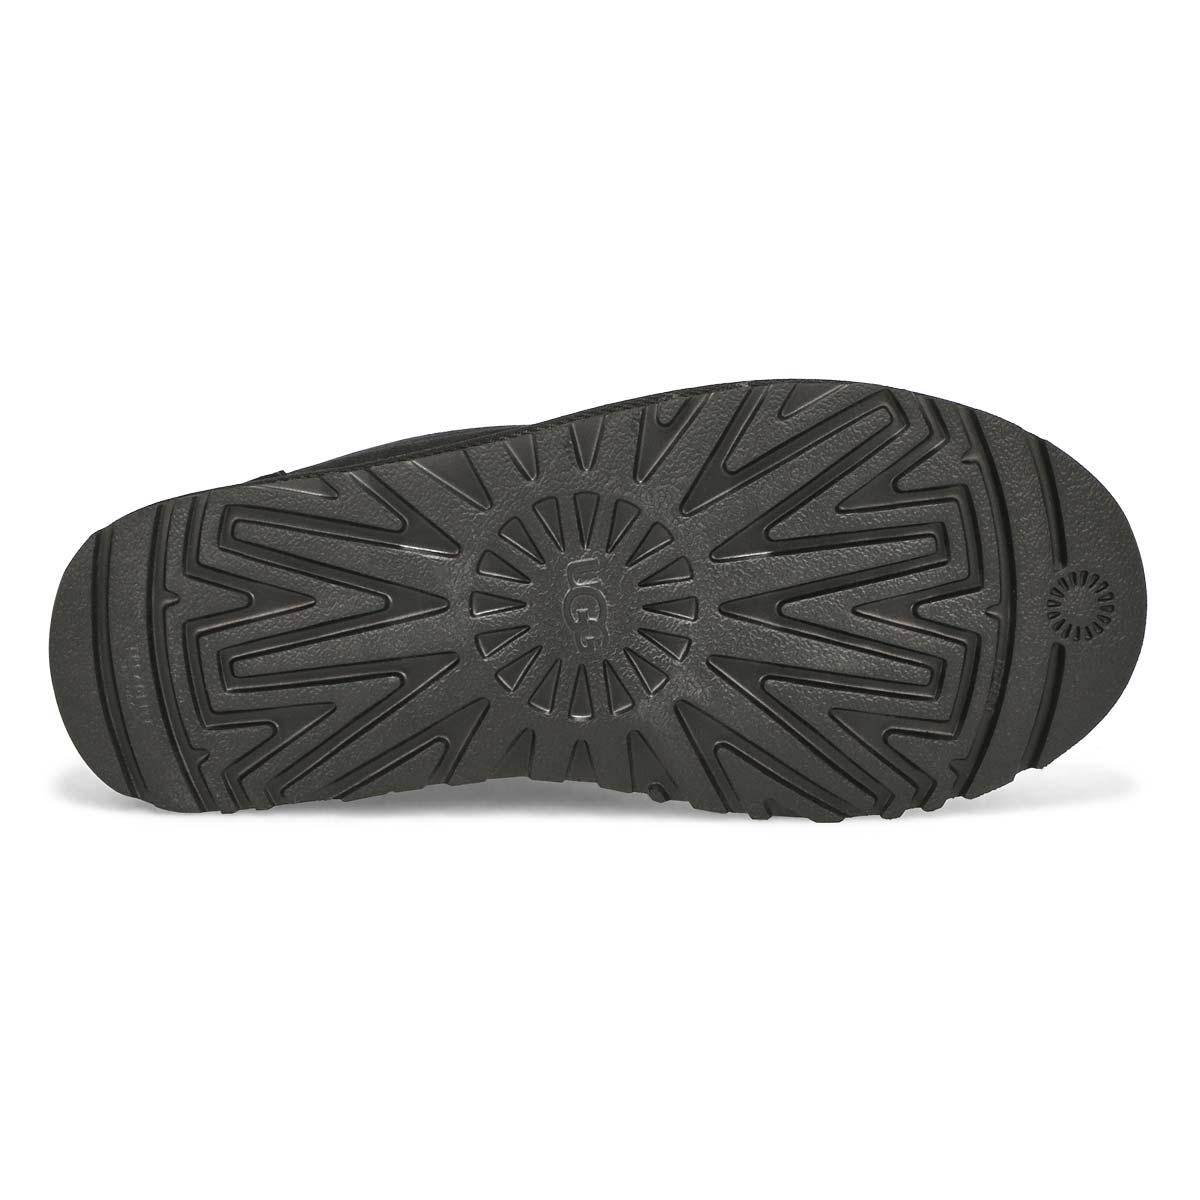 Mns Neumel black lined chukka boot